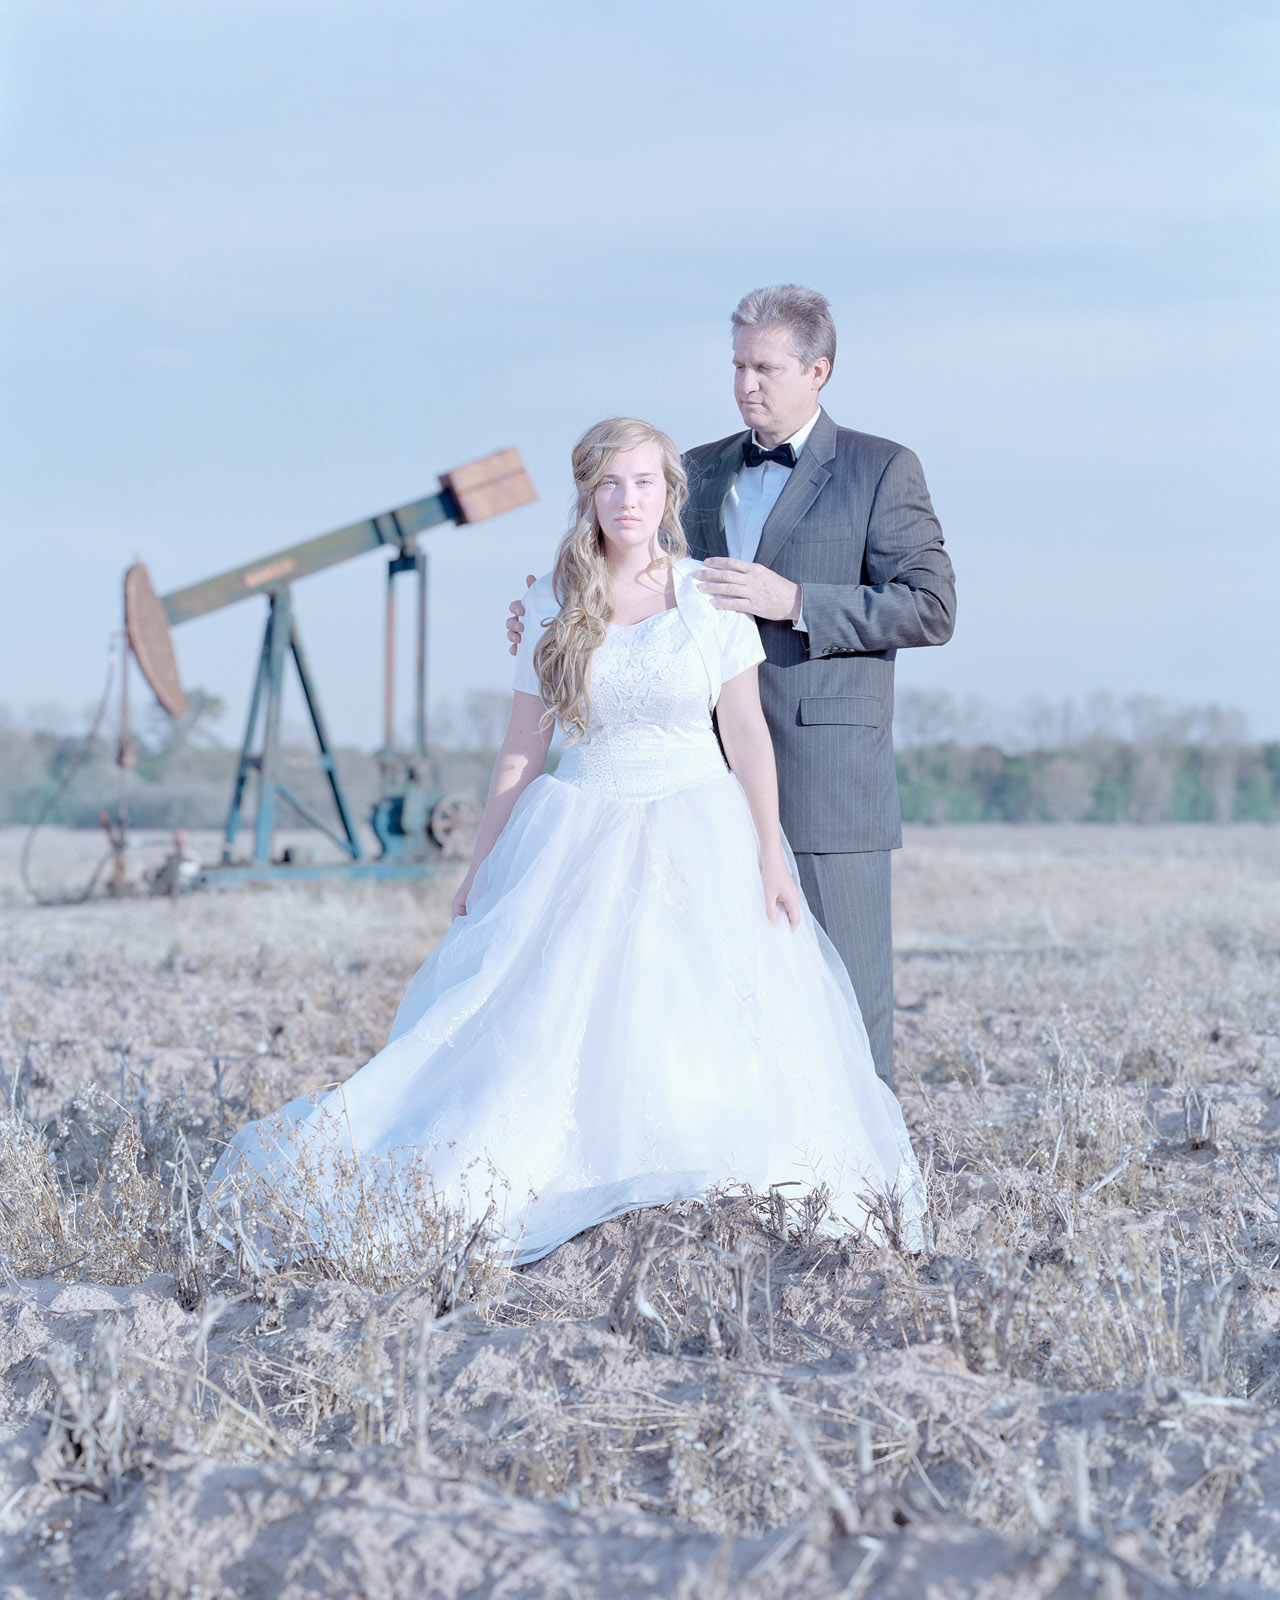 Rose & Randall Smoak, Dixie, Louisiana